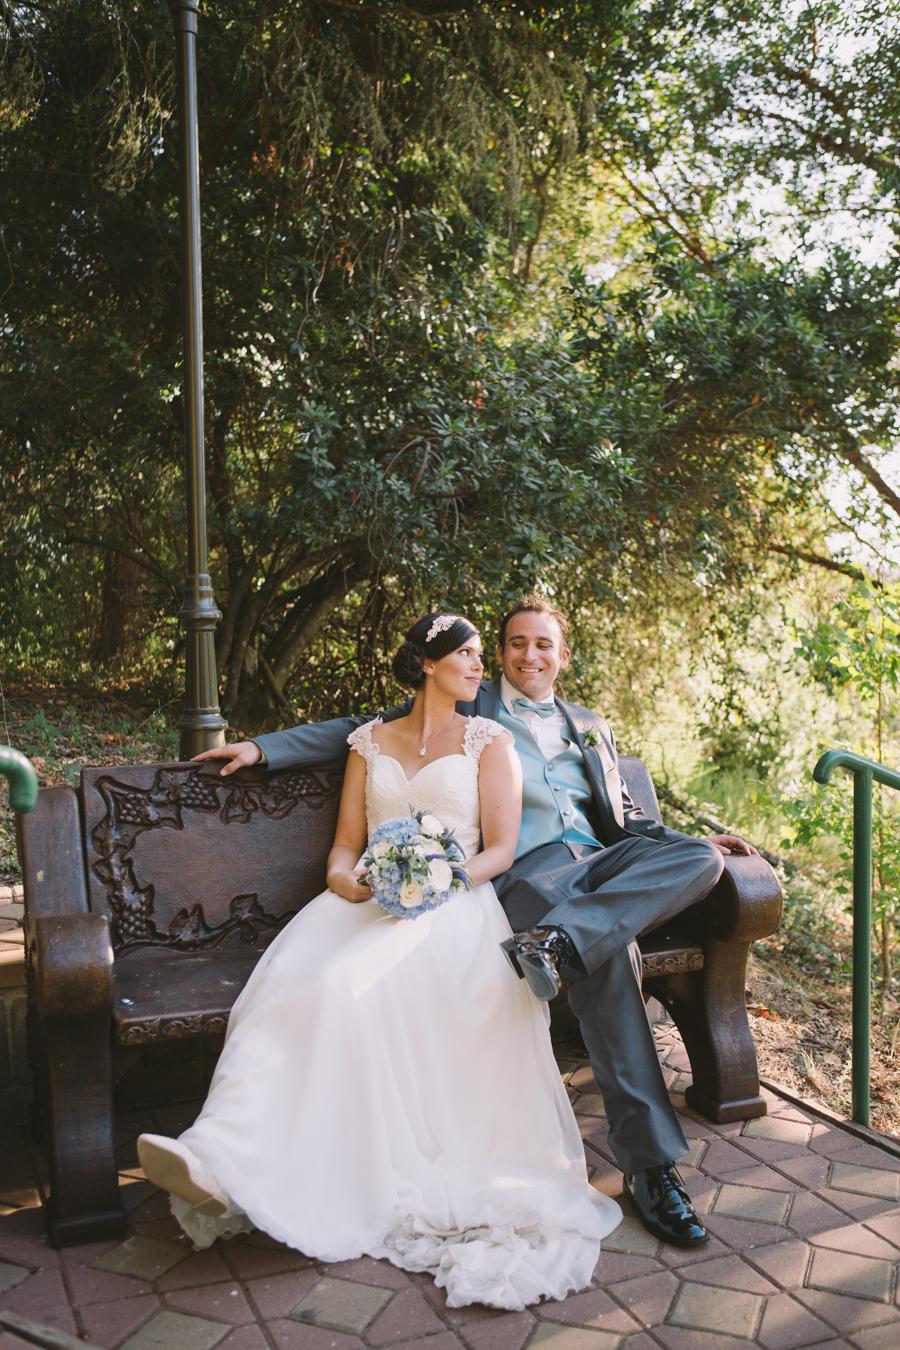 pema-osel-ling-wedding-photography (133)